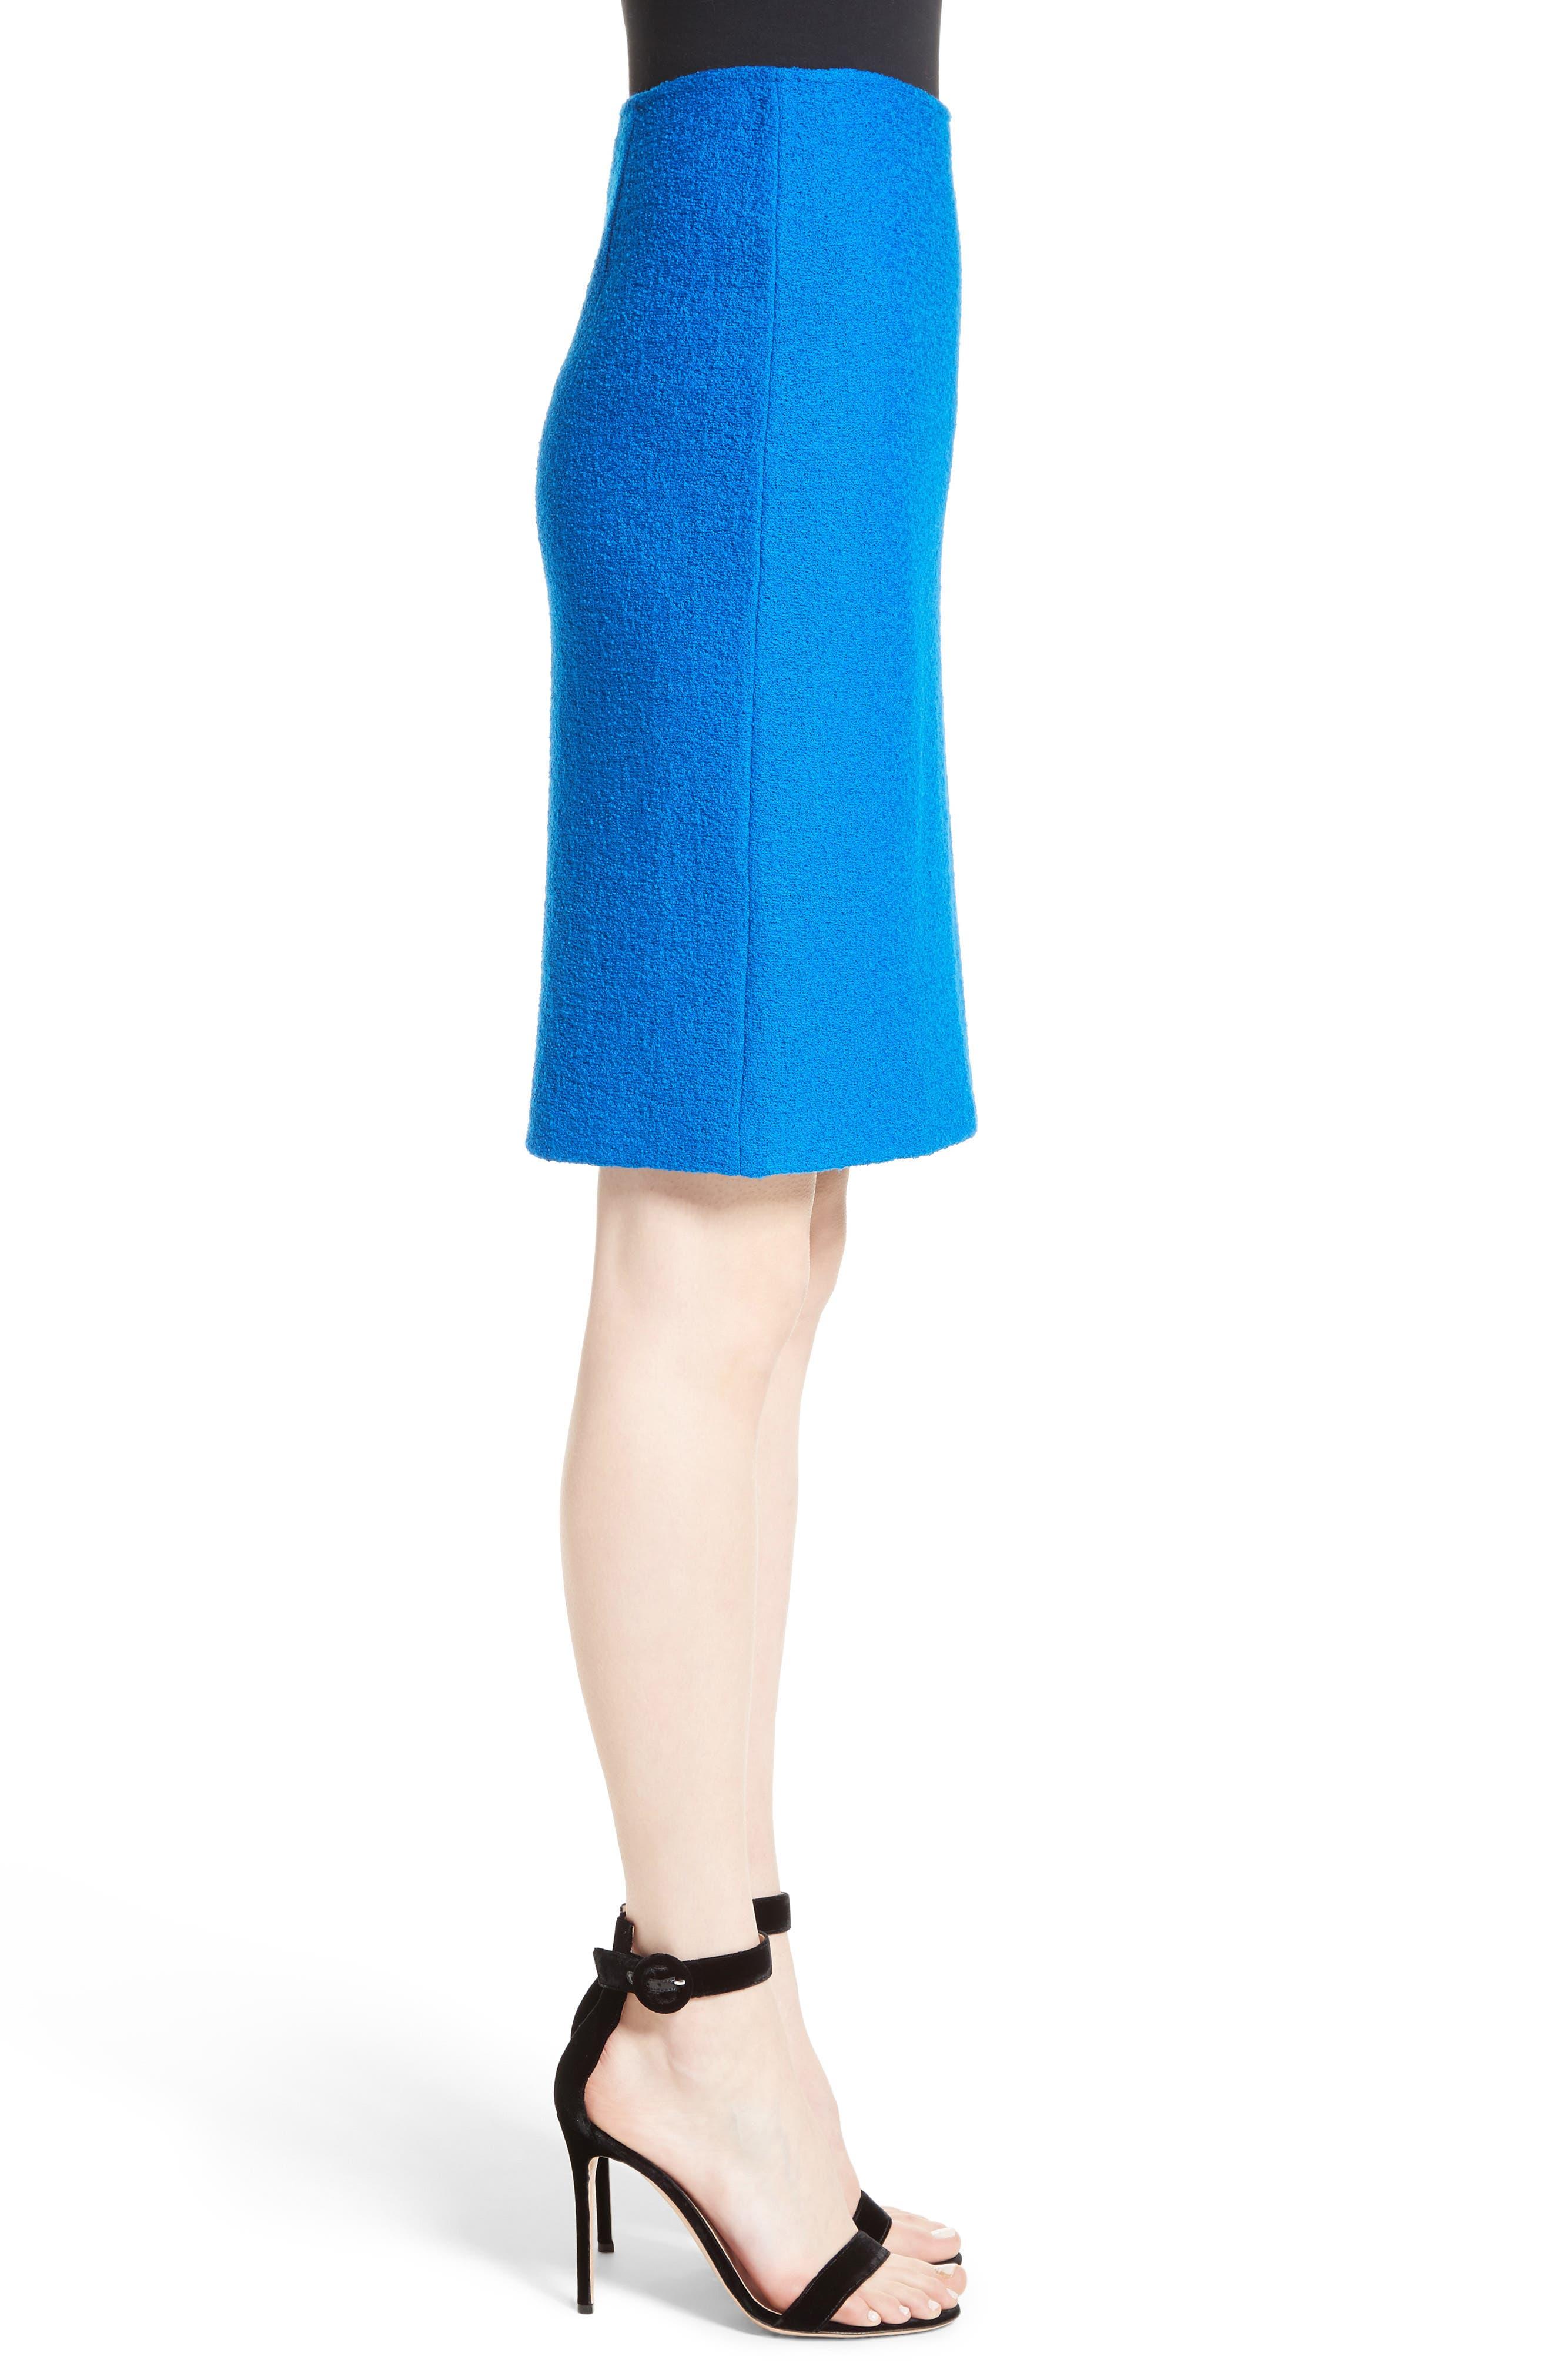 Clair Knit Pencil Skirt,                             Alternate thumbnail 3, color,                             430